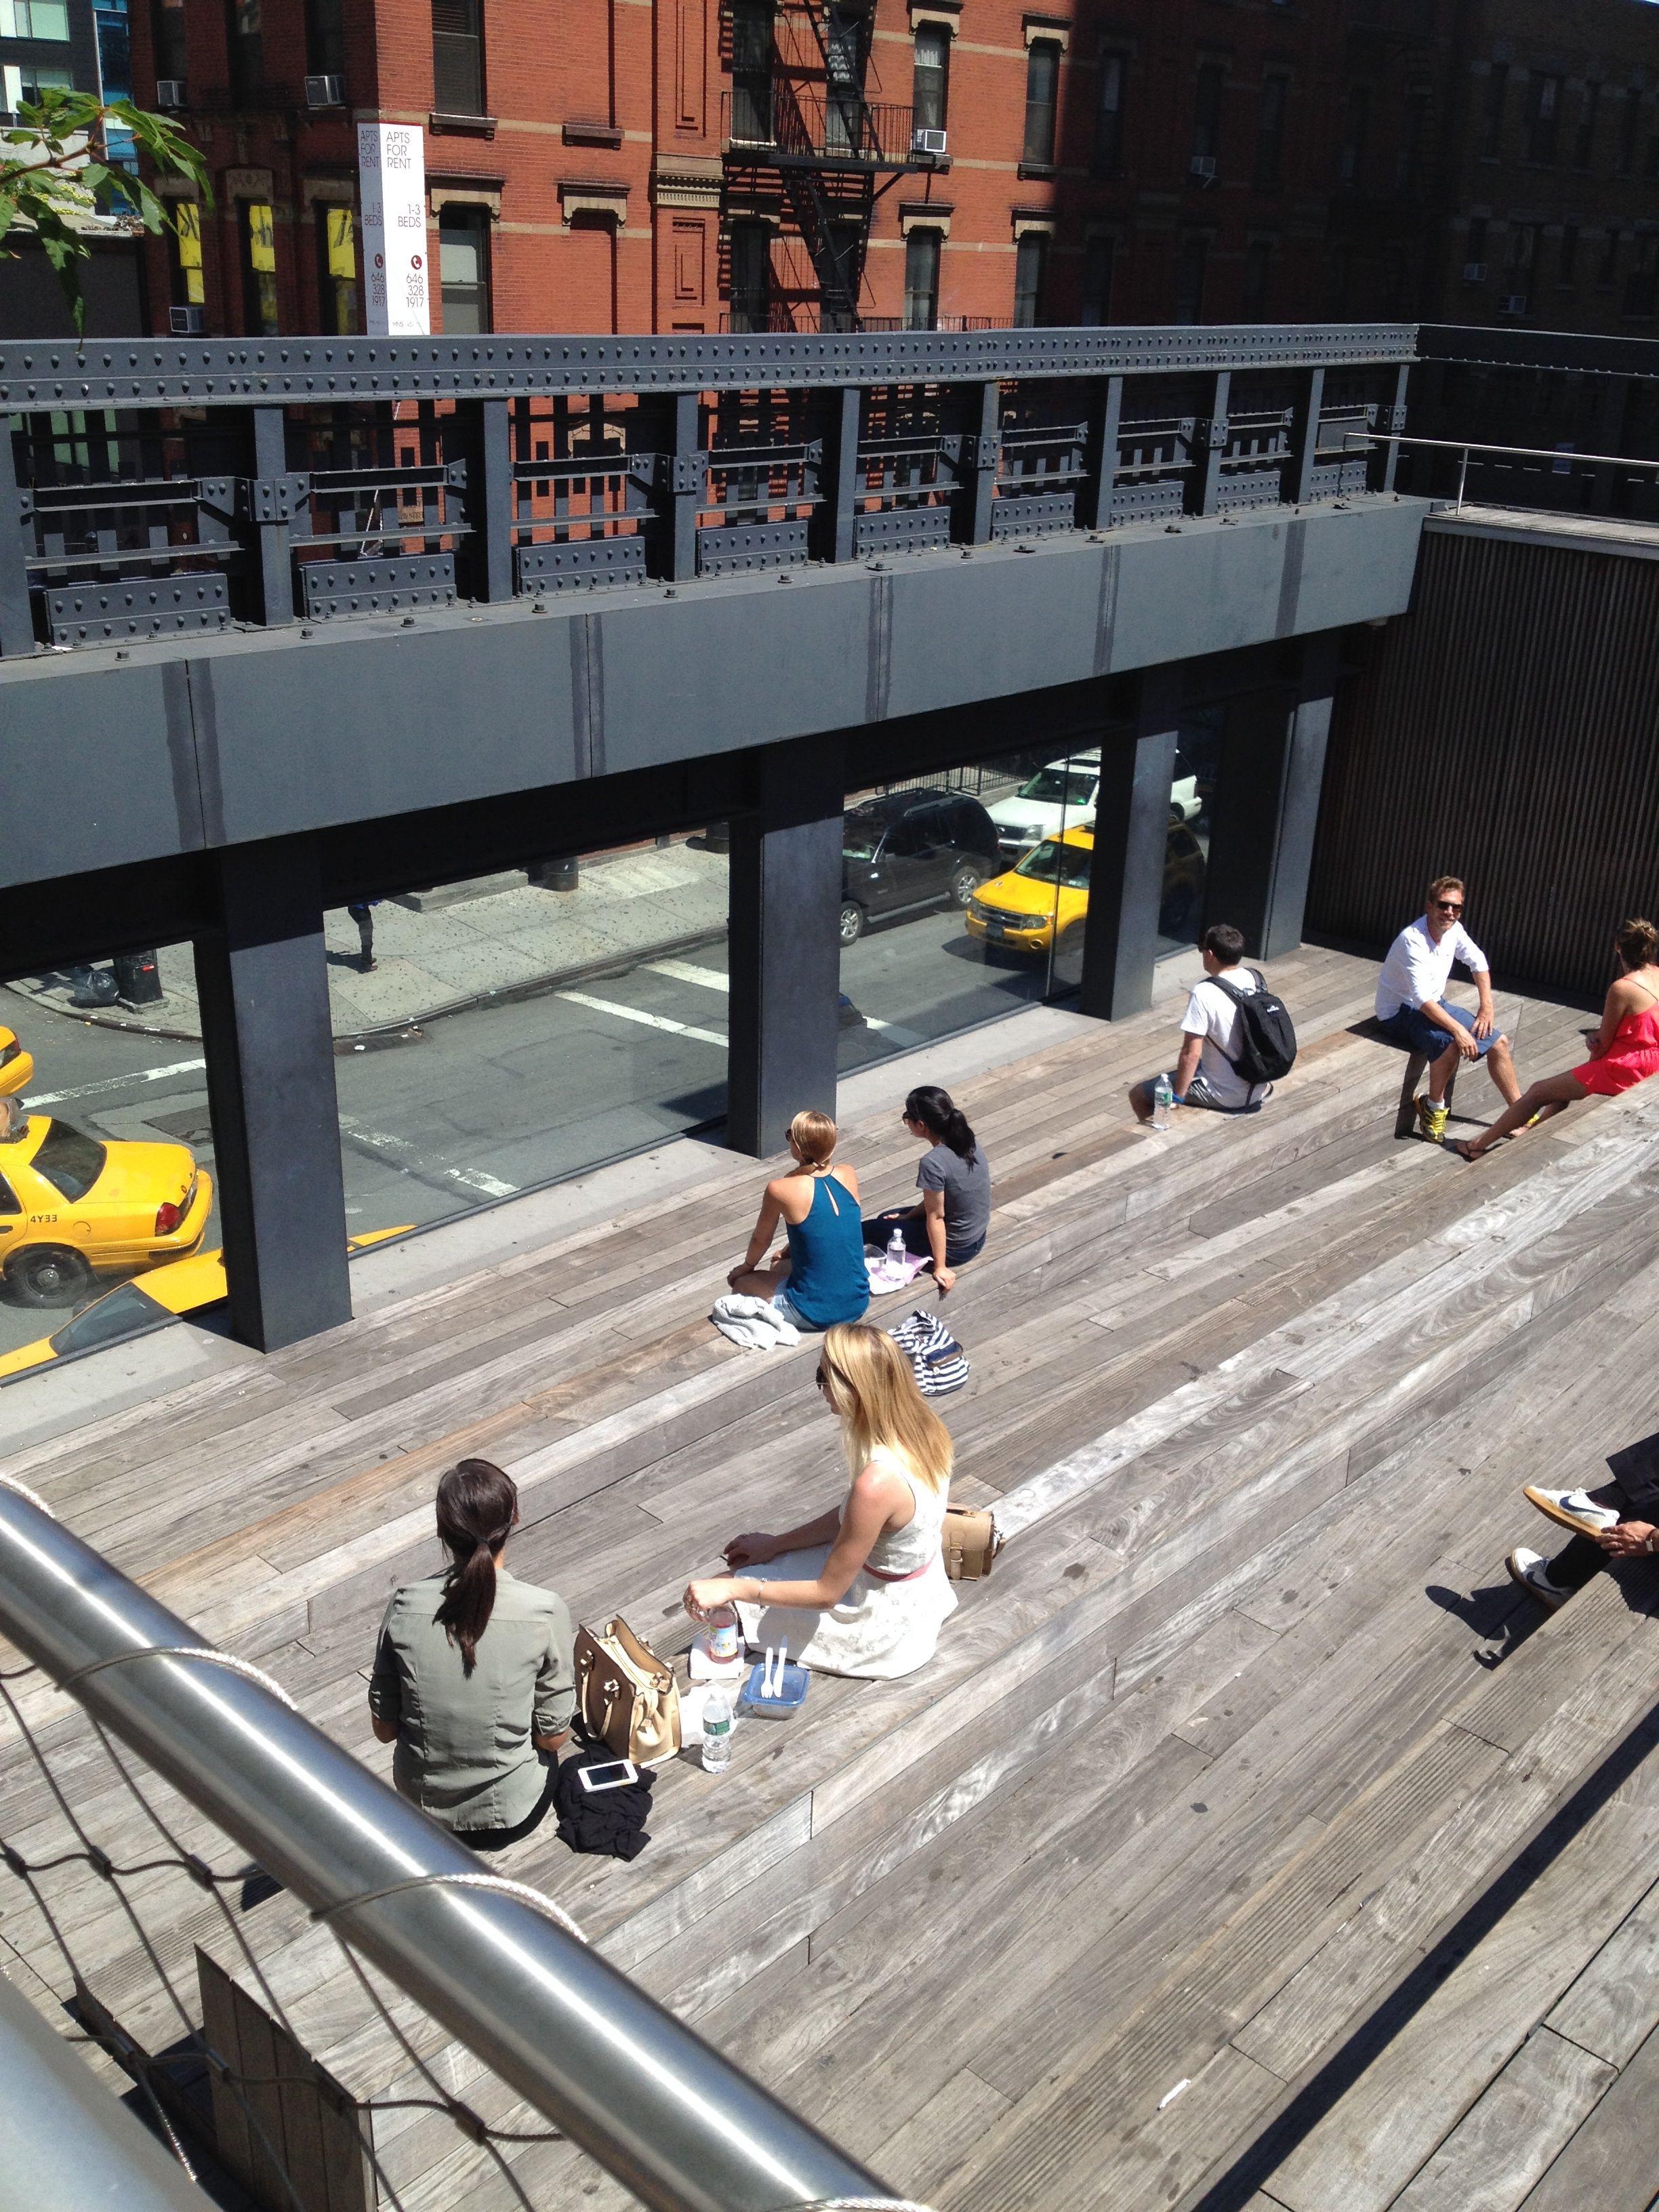 Doily Bird on tour... The High Line, above Chelsea Market, New York.